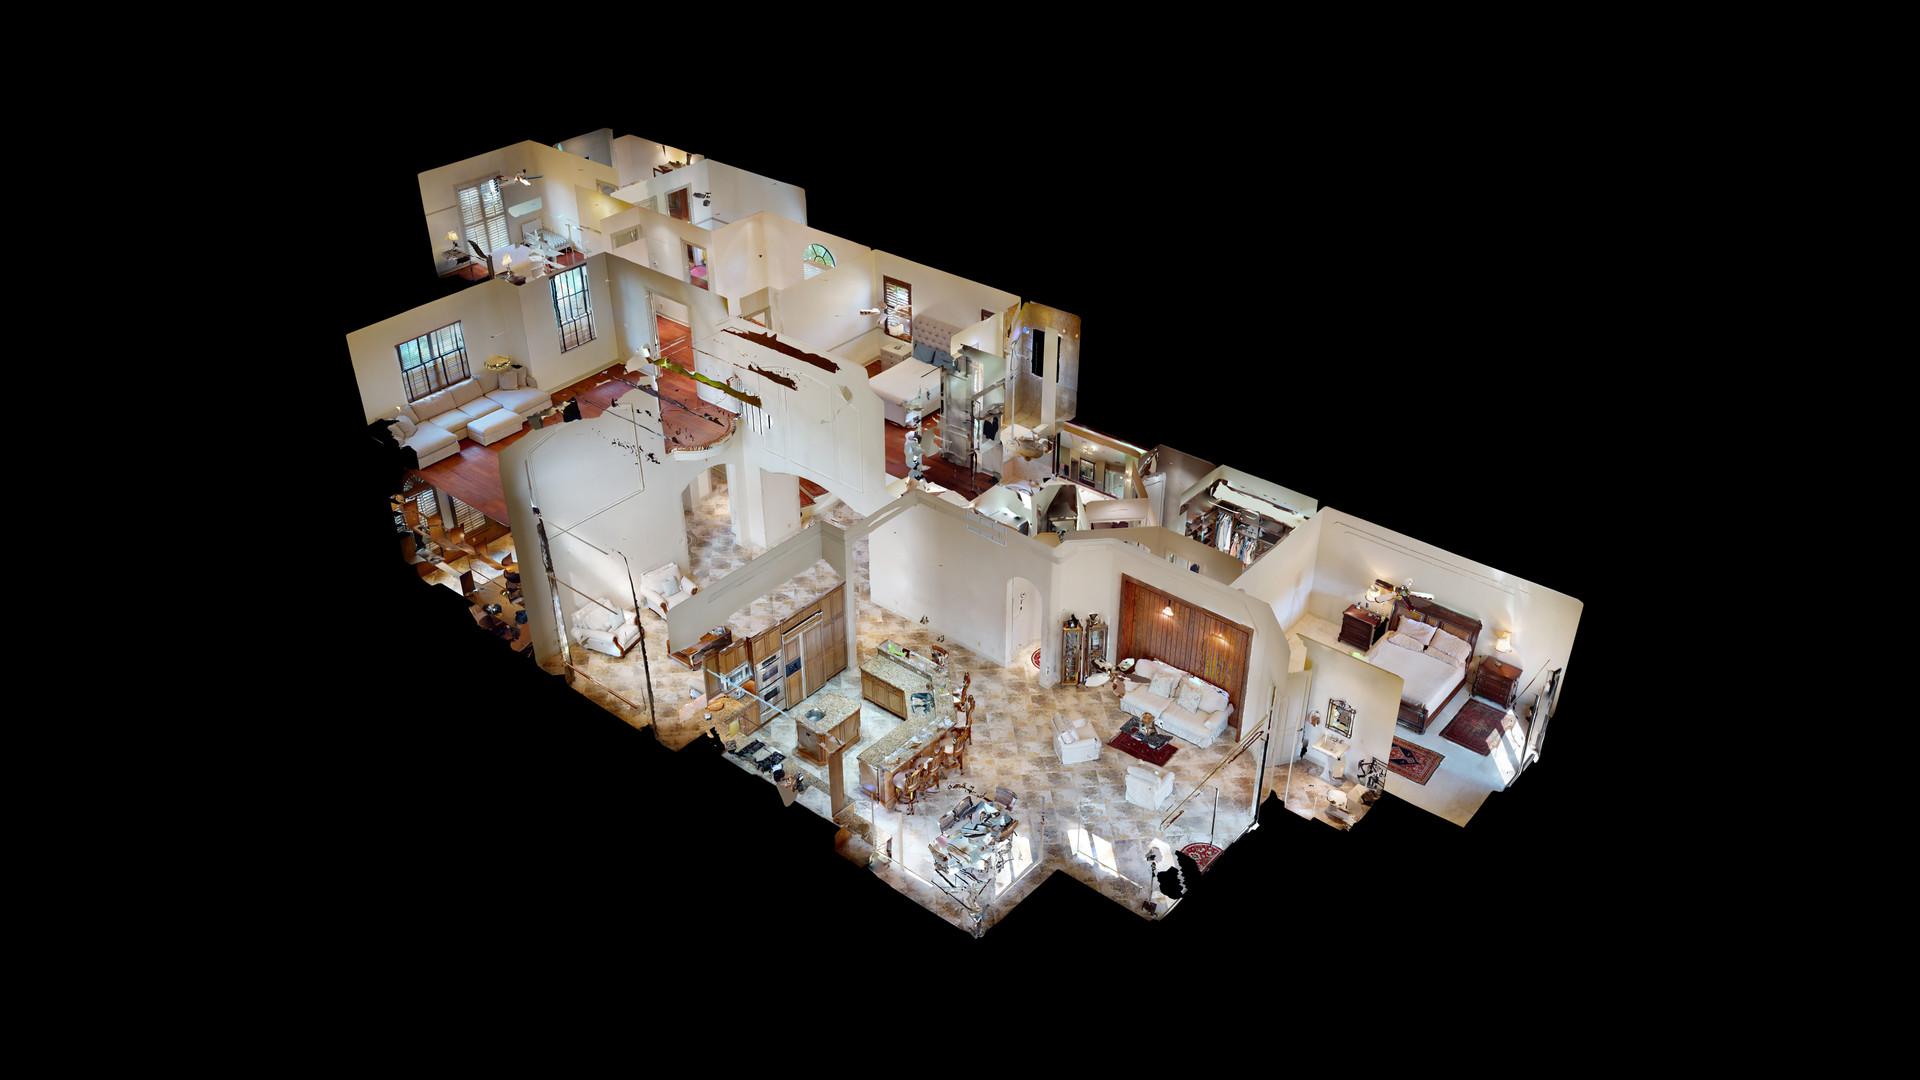 17760-Villa-Club-Way-Dollhouse-View.jpg